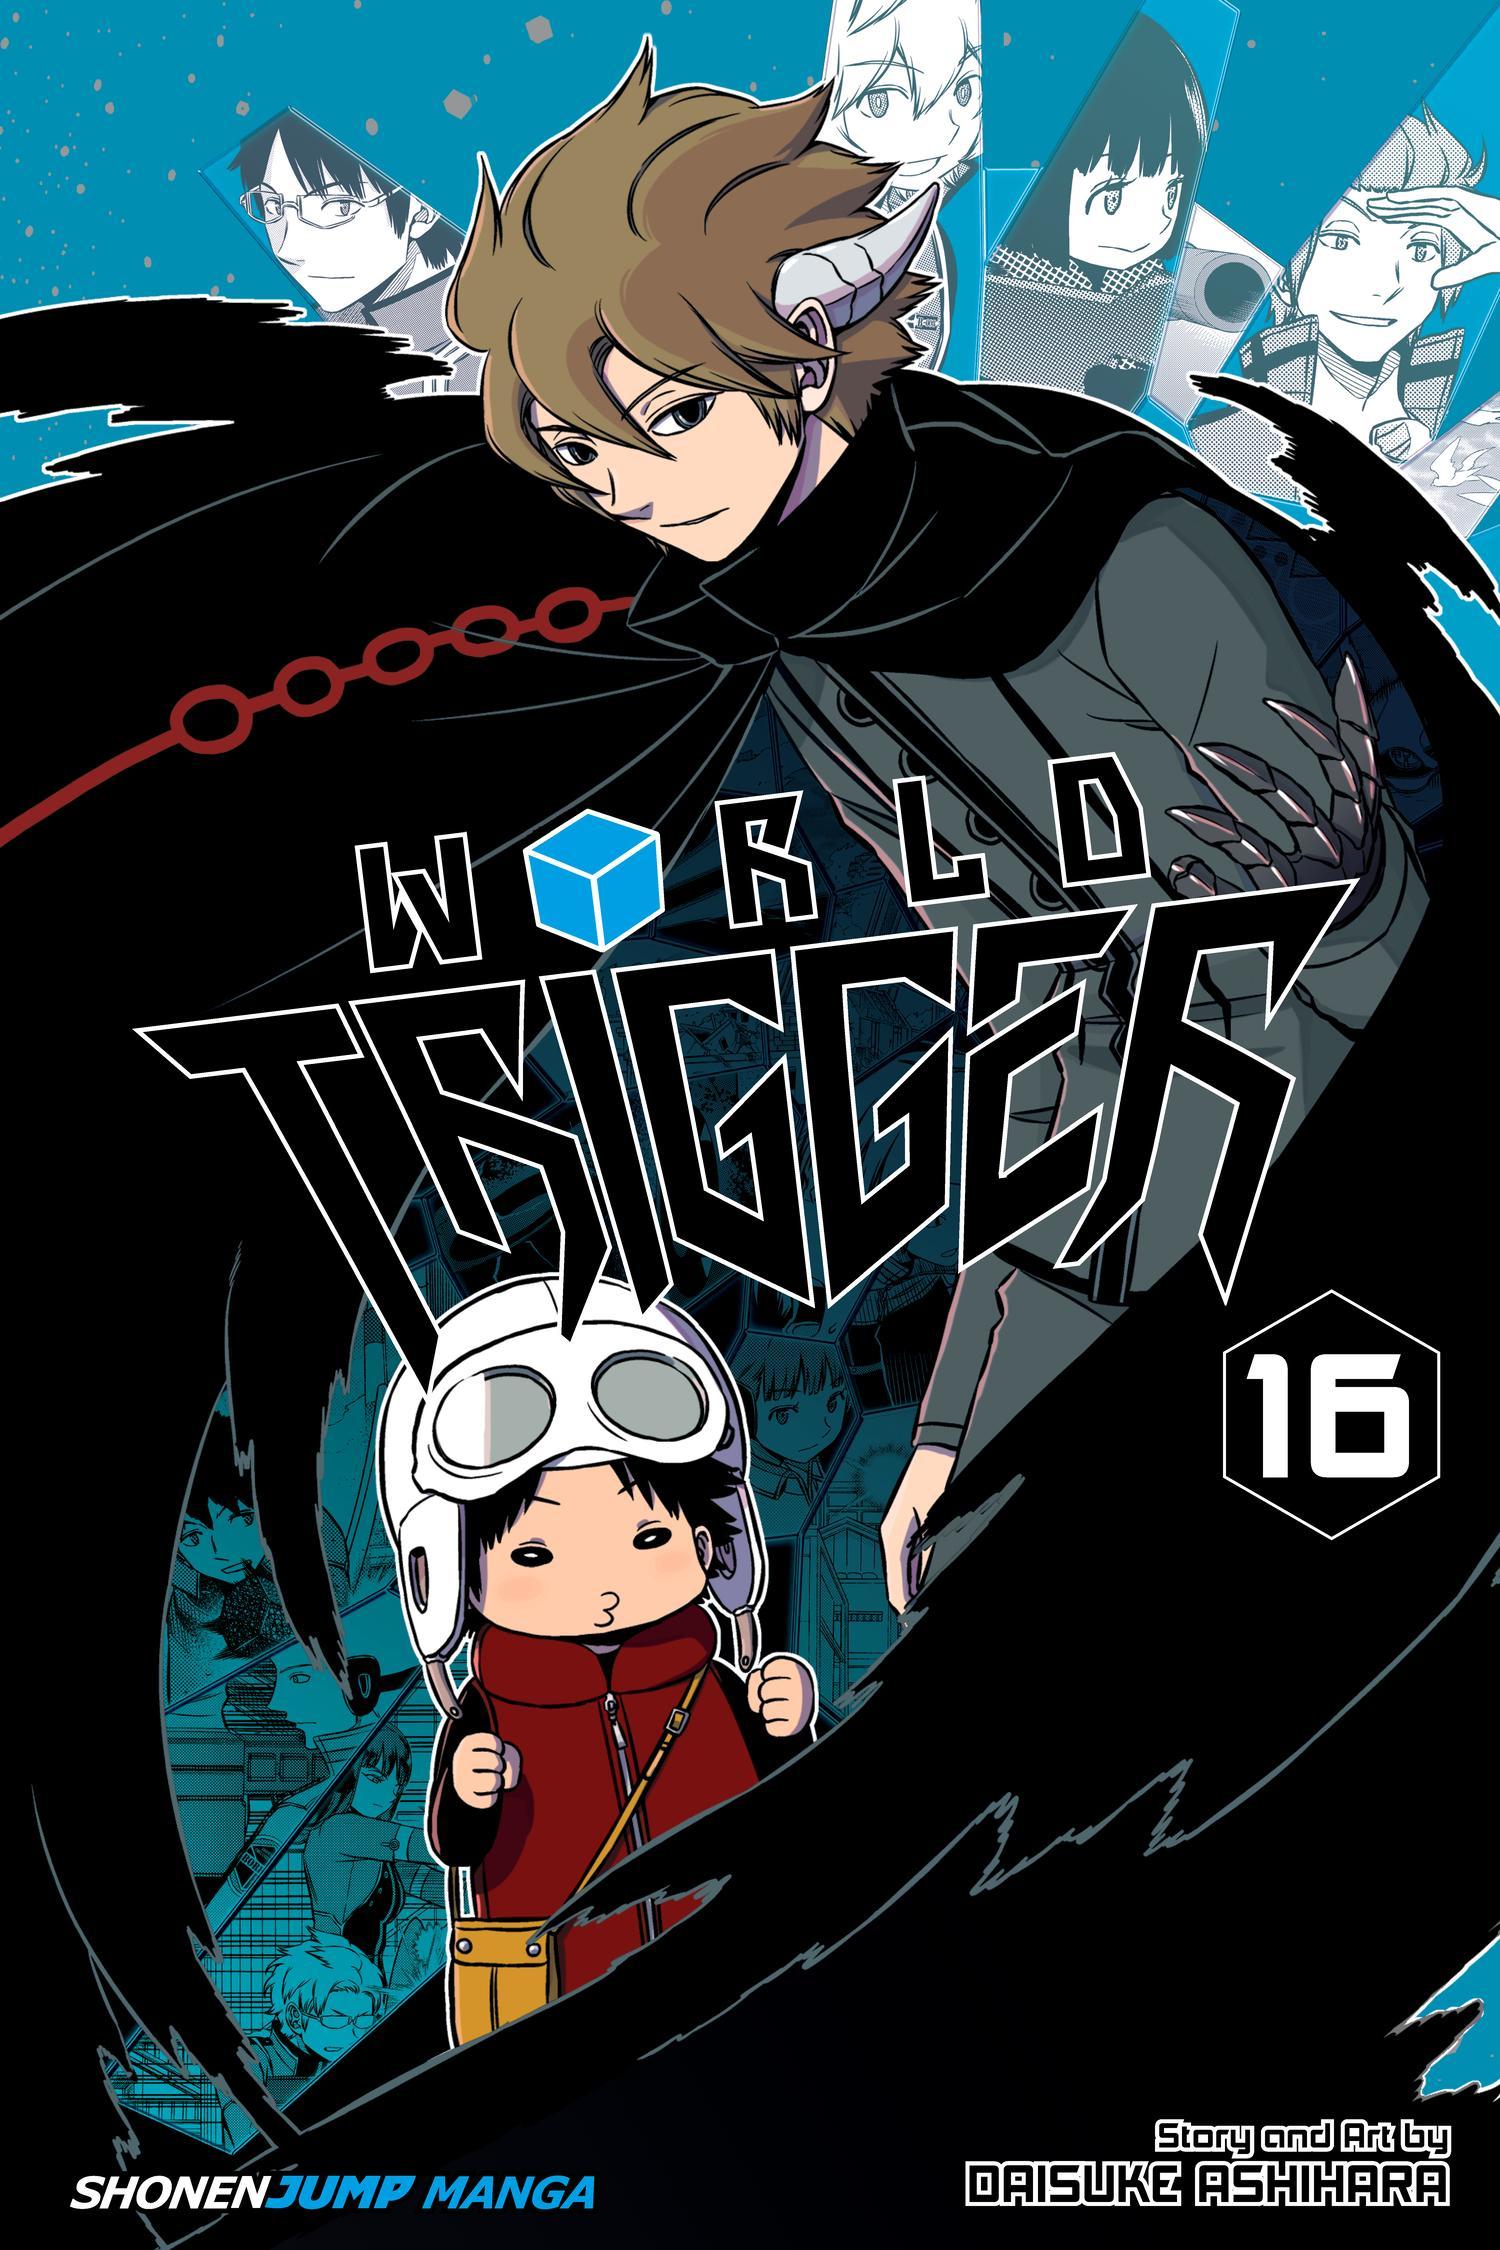 World Trigger v16 2017 Digital LuCaZ